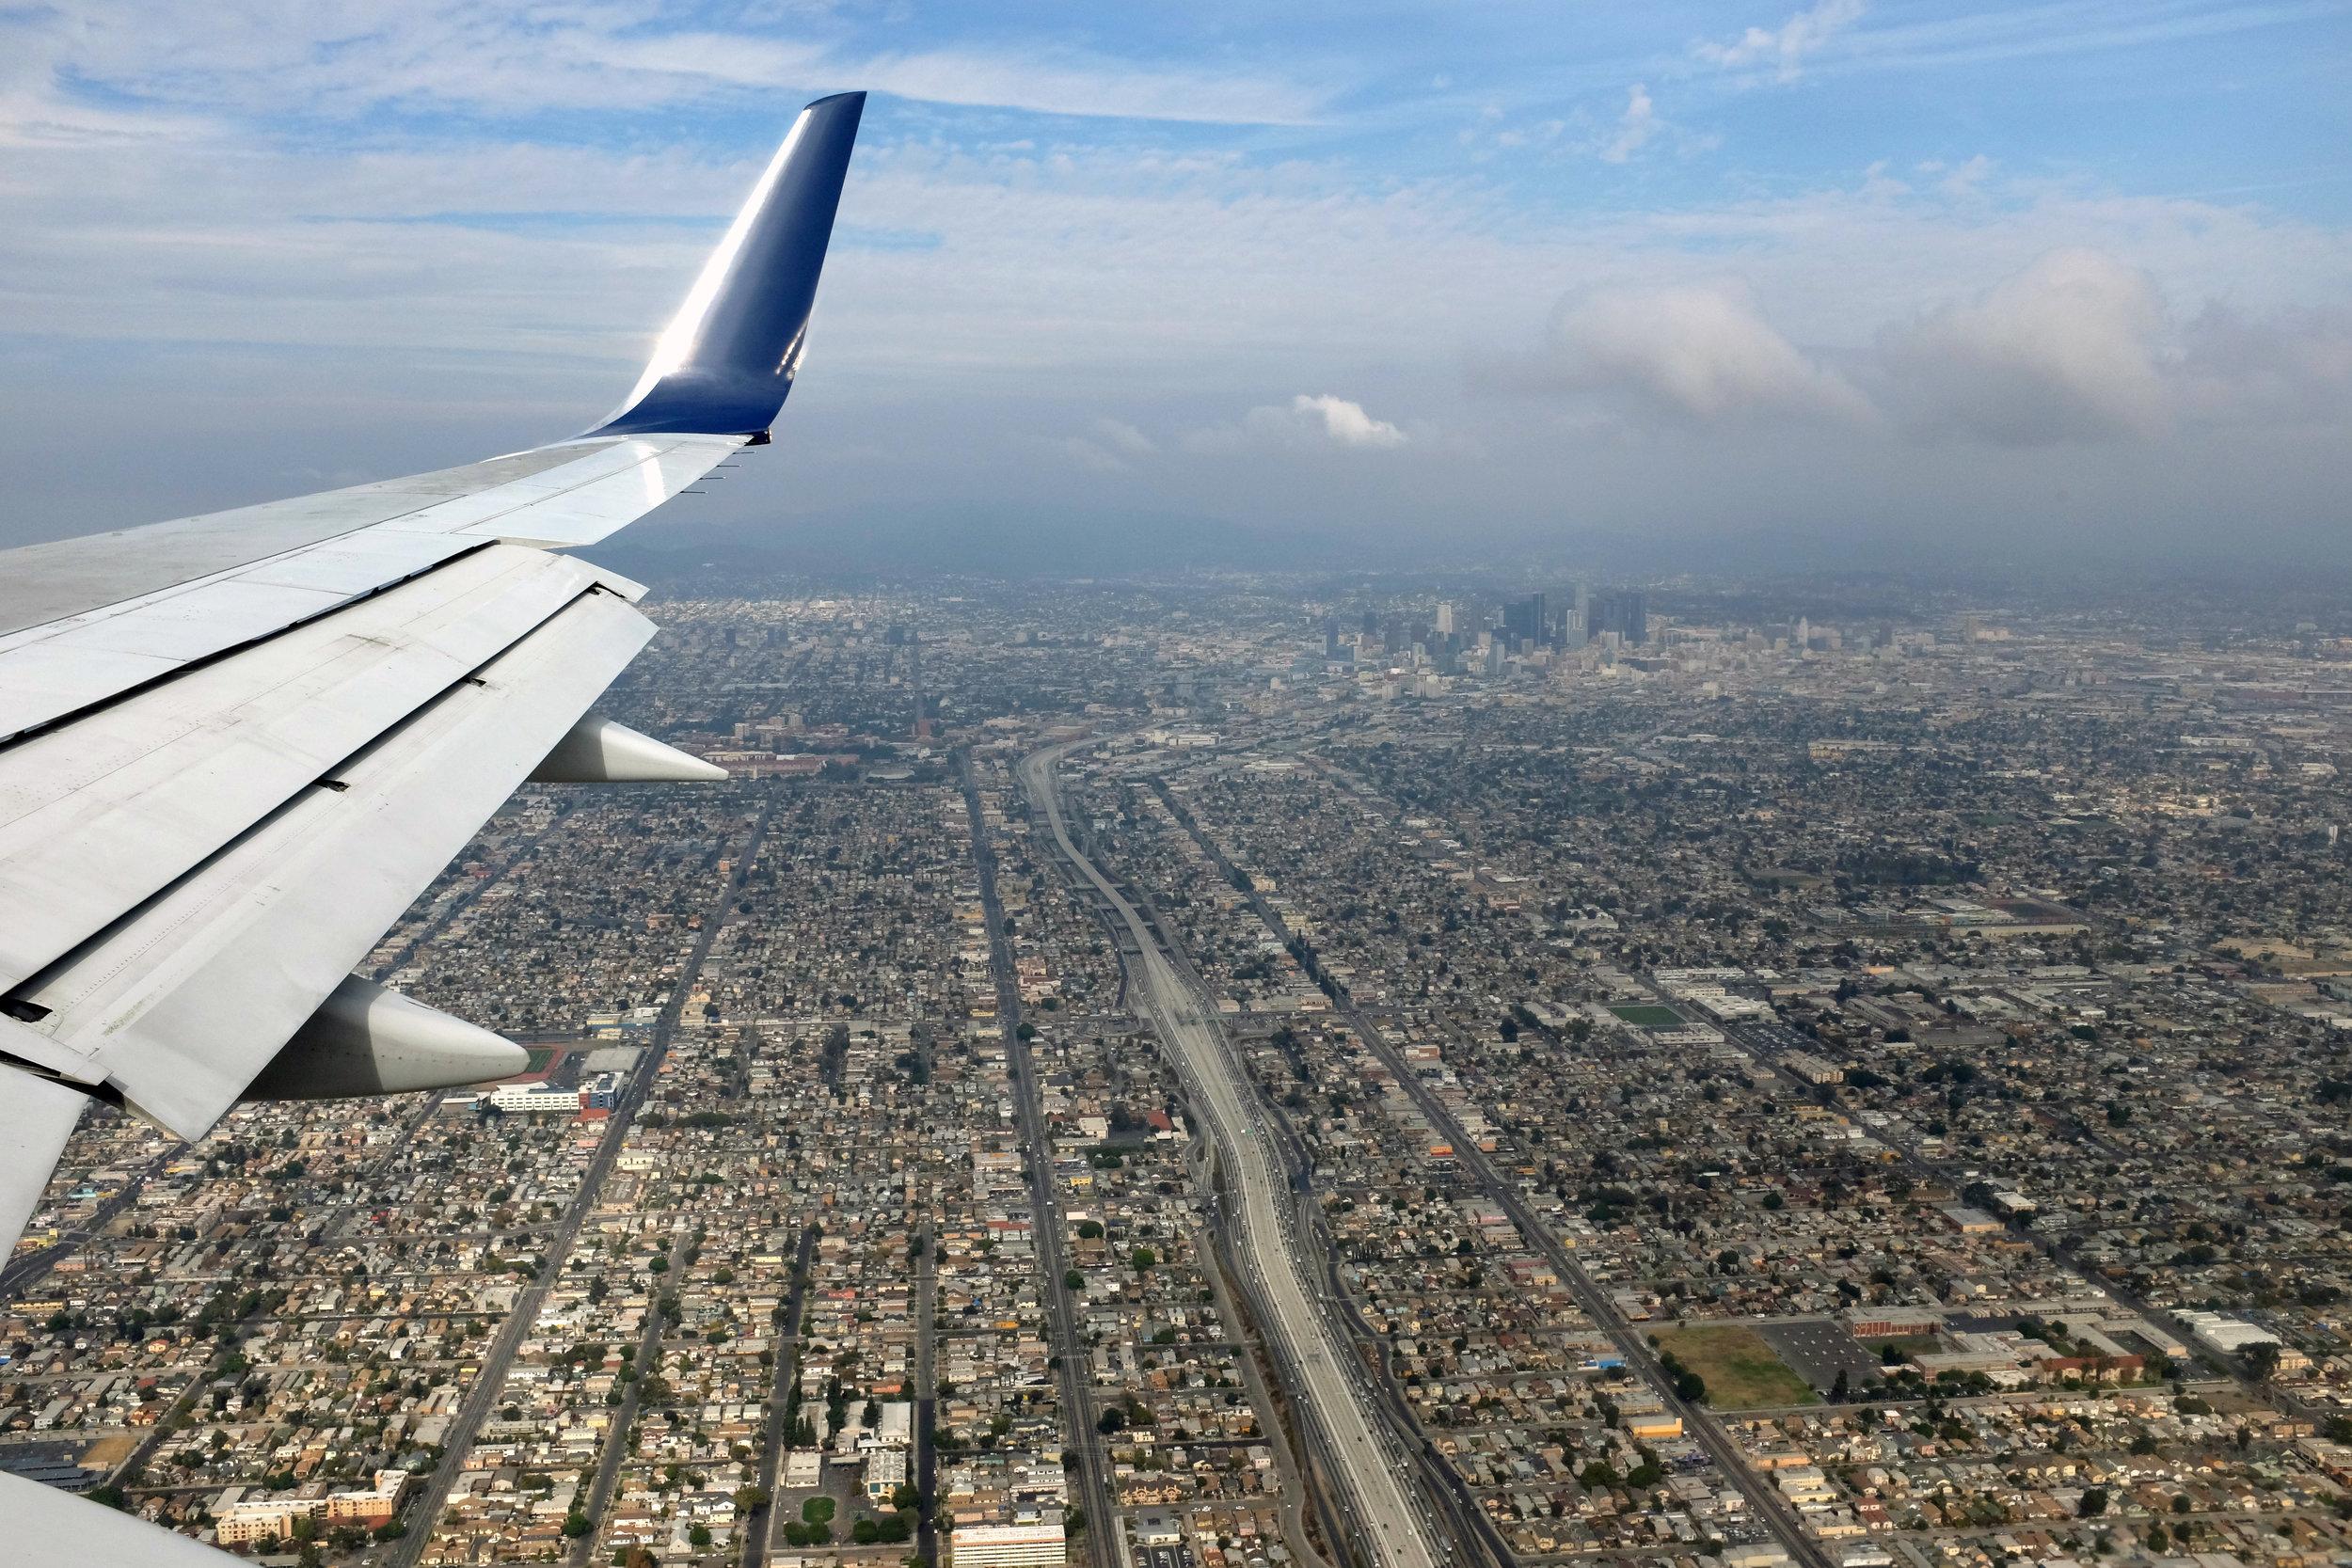 Airplane_LA2309.jpg